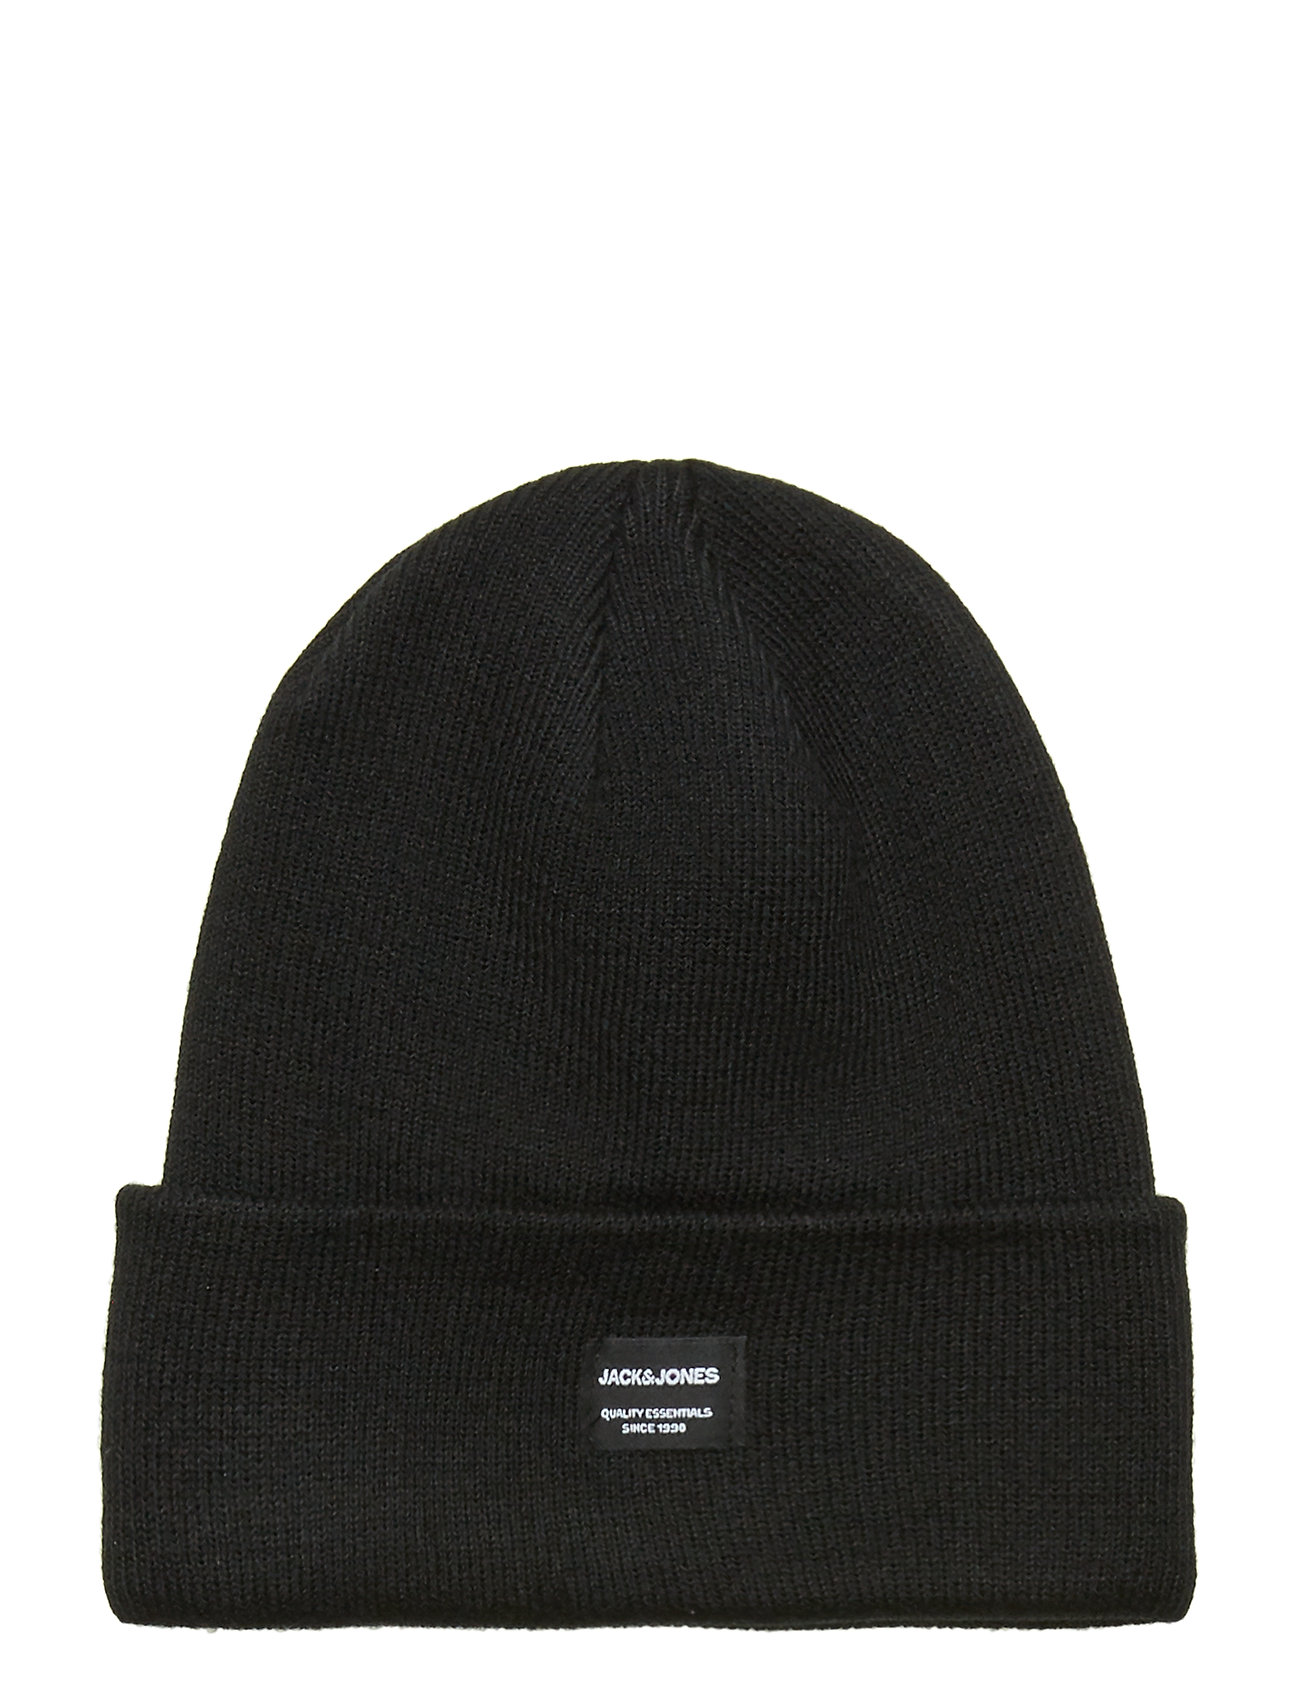 Image of Jacdna Beanie Noos Accessories Hats & Caps Beanies Sort Jack & J S (3213733545)